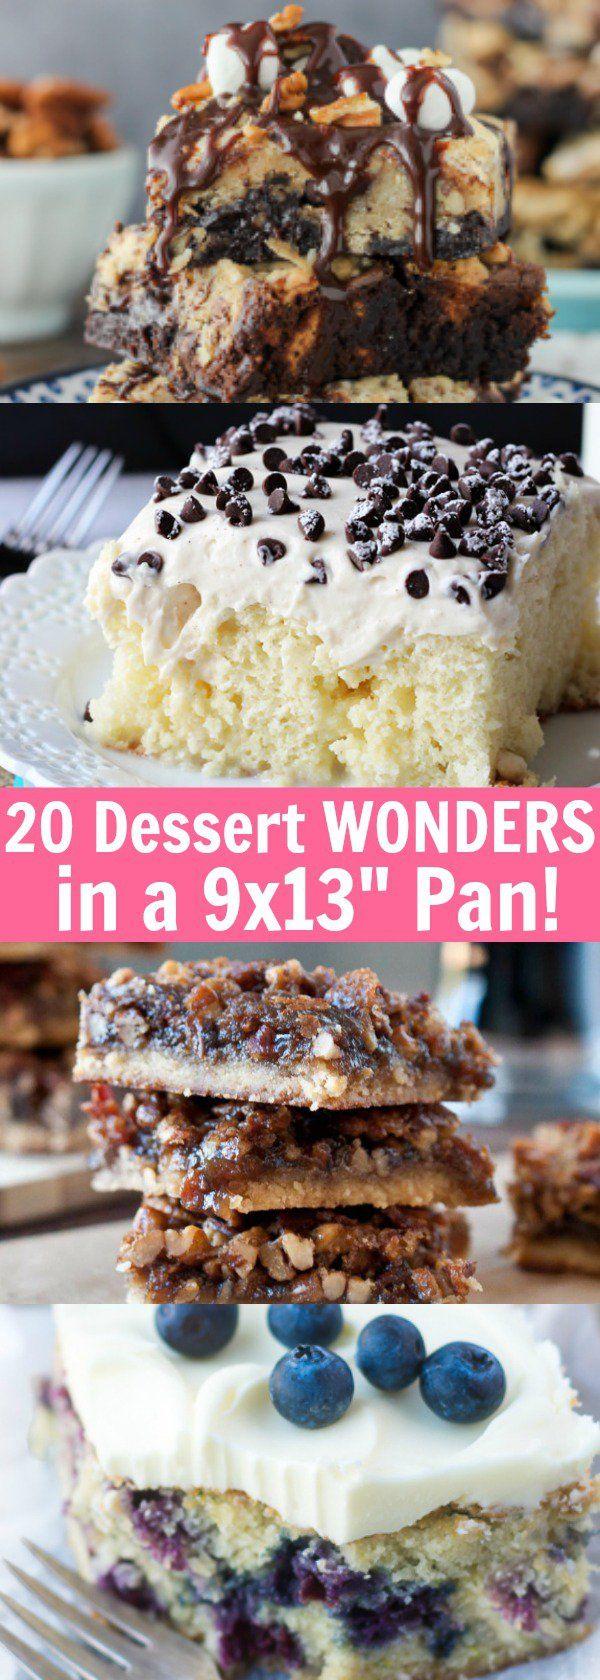 "20 Dessert Wonders Made in a 9x13"" Pan!"